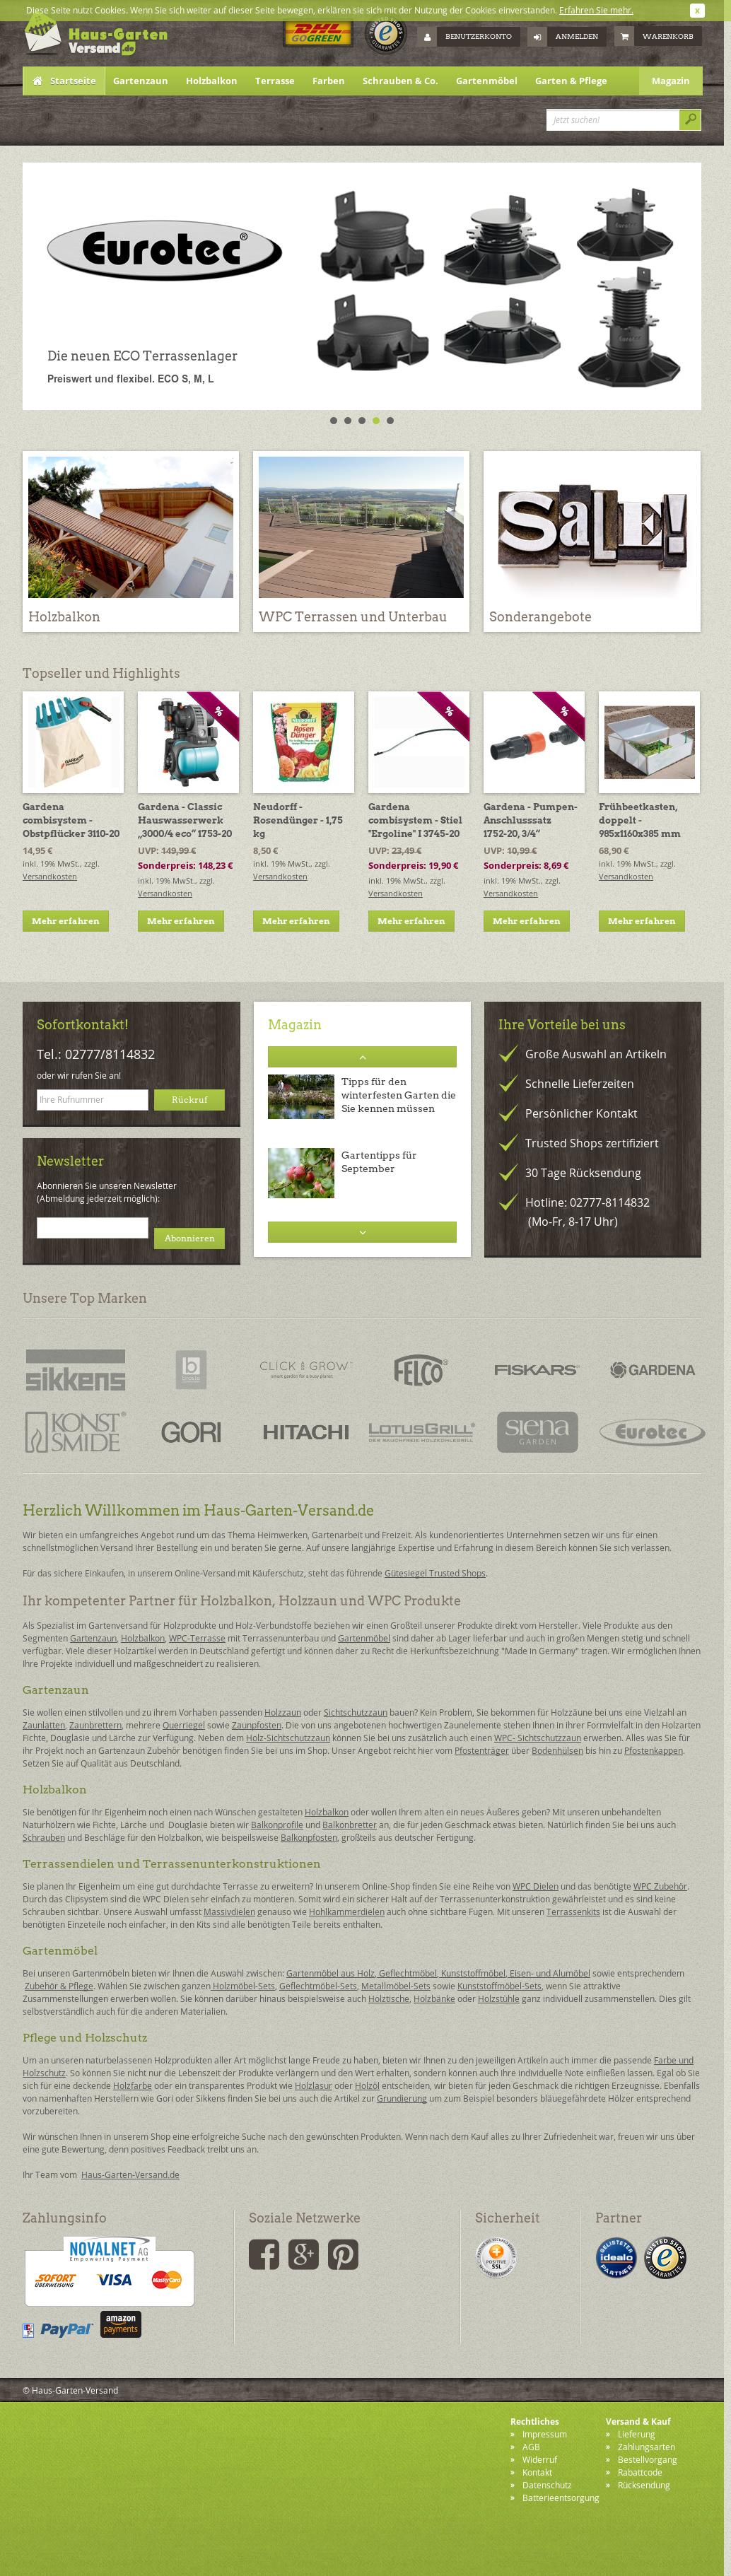 Haus Garten Versand.de Competitors, Revenue And Employees   Owler Company  Profile